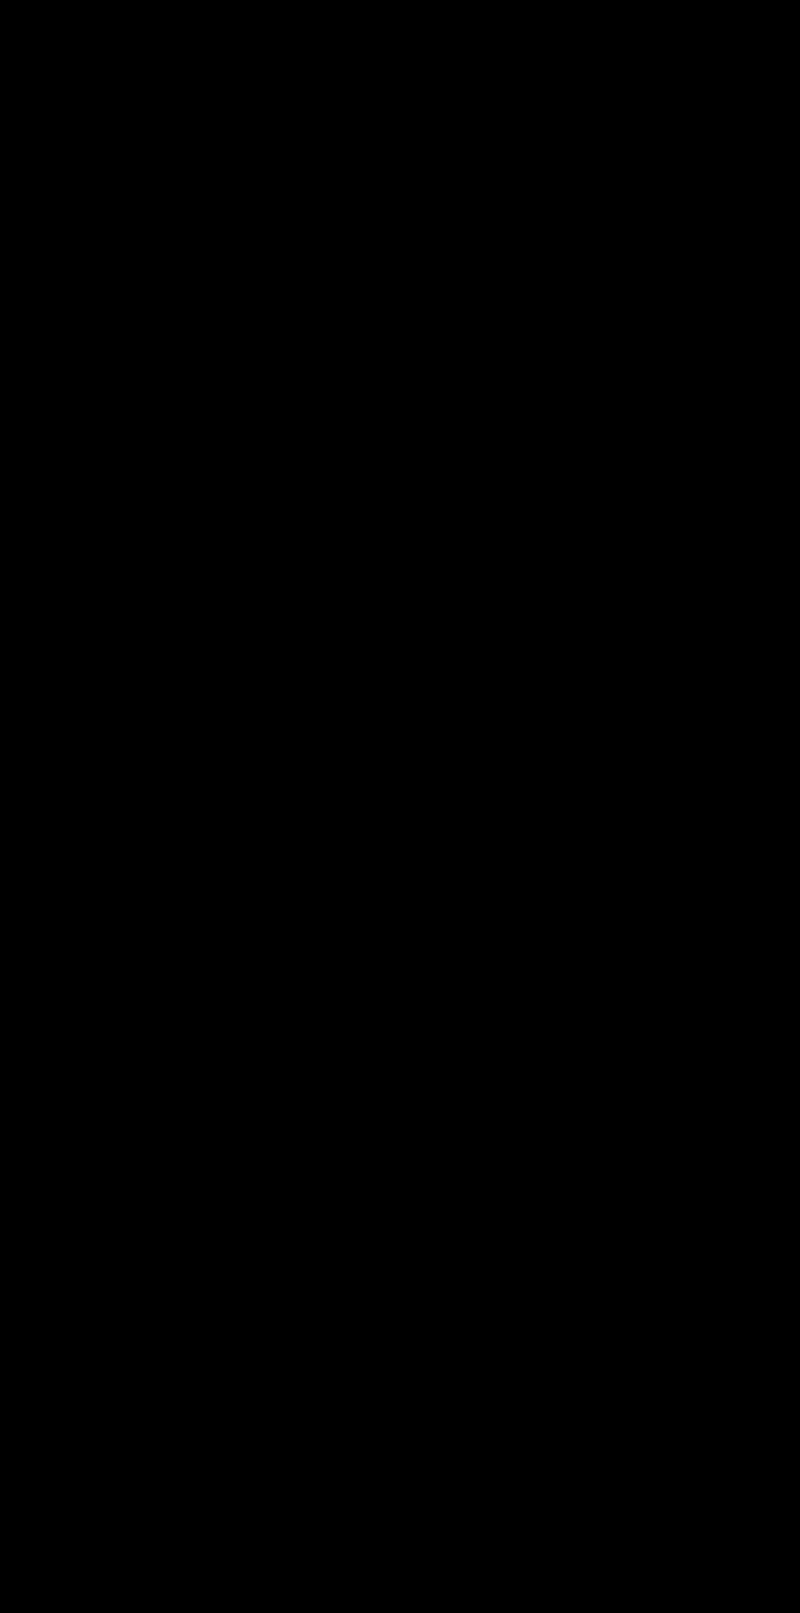 Coiffure SB logo vector